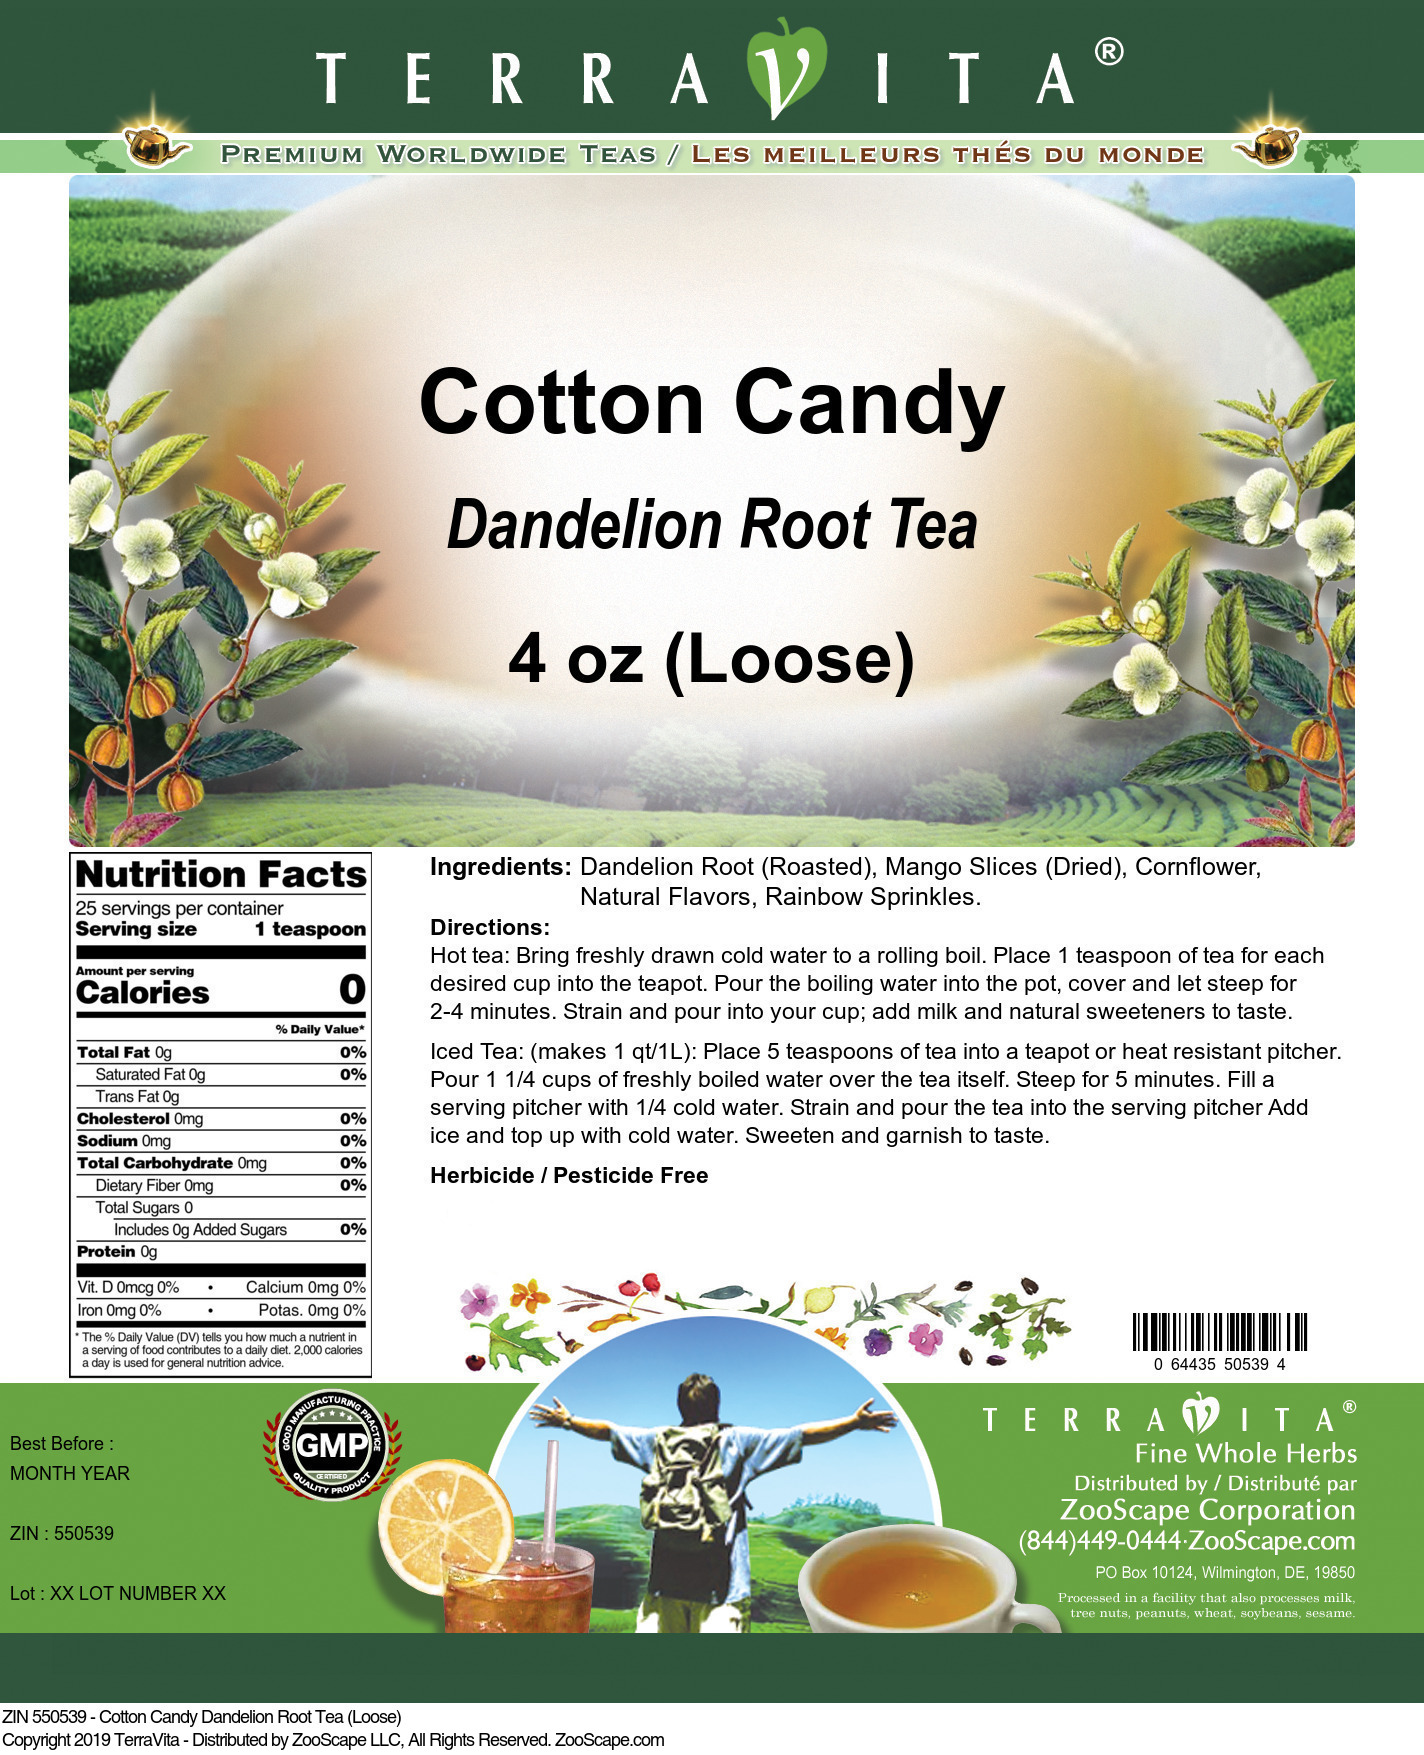 Cotton Candy Dandelion Root